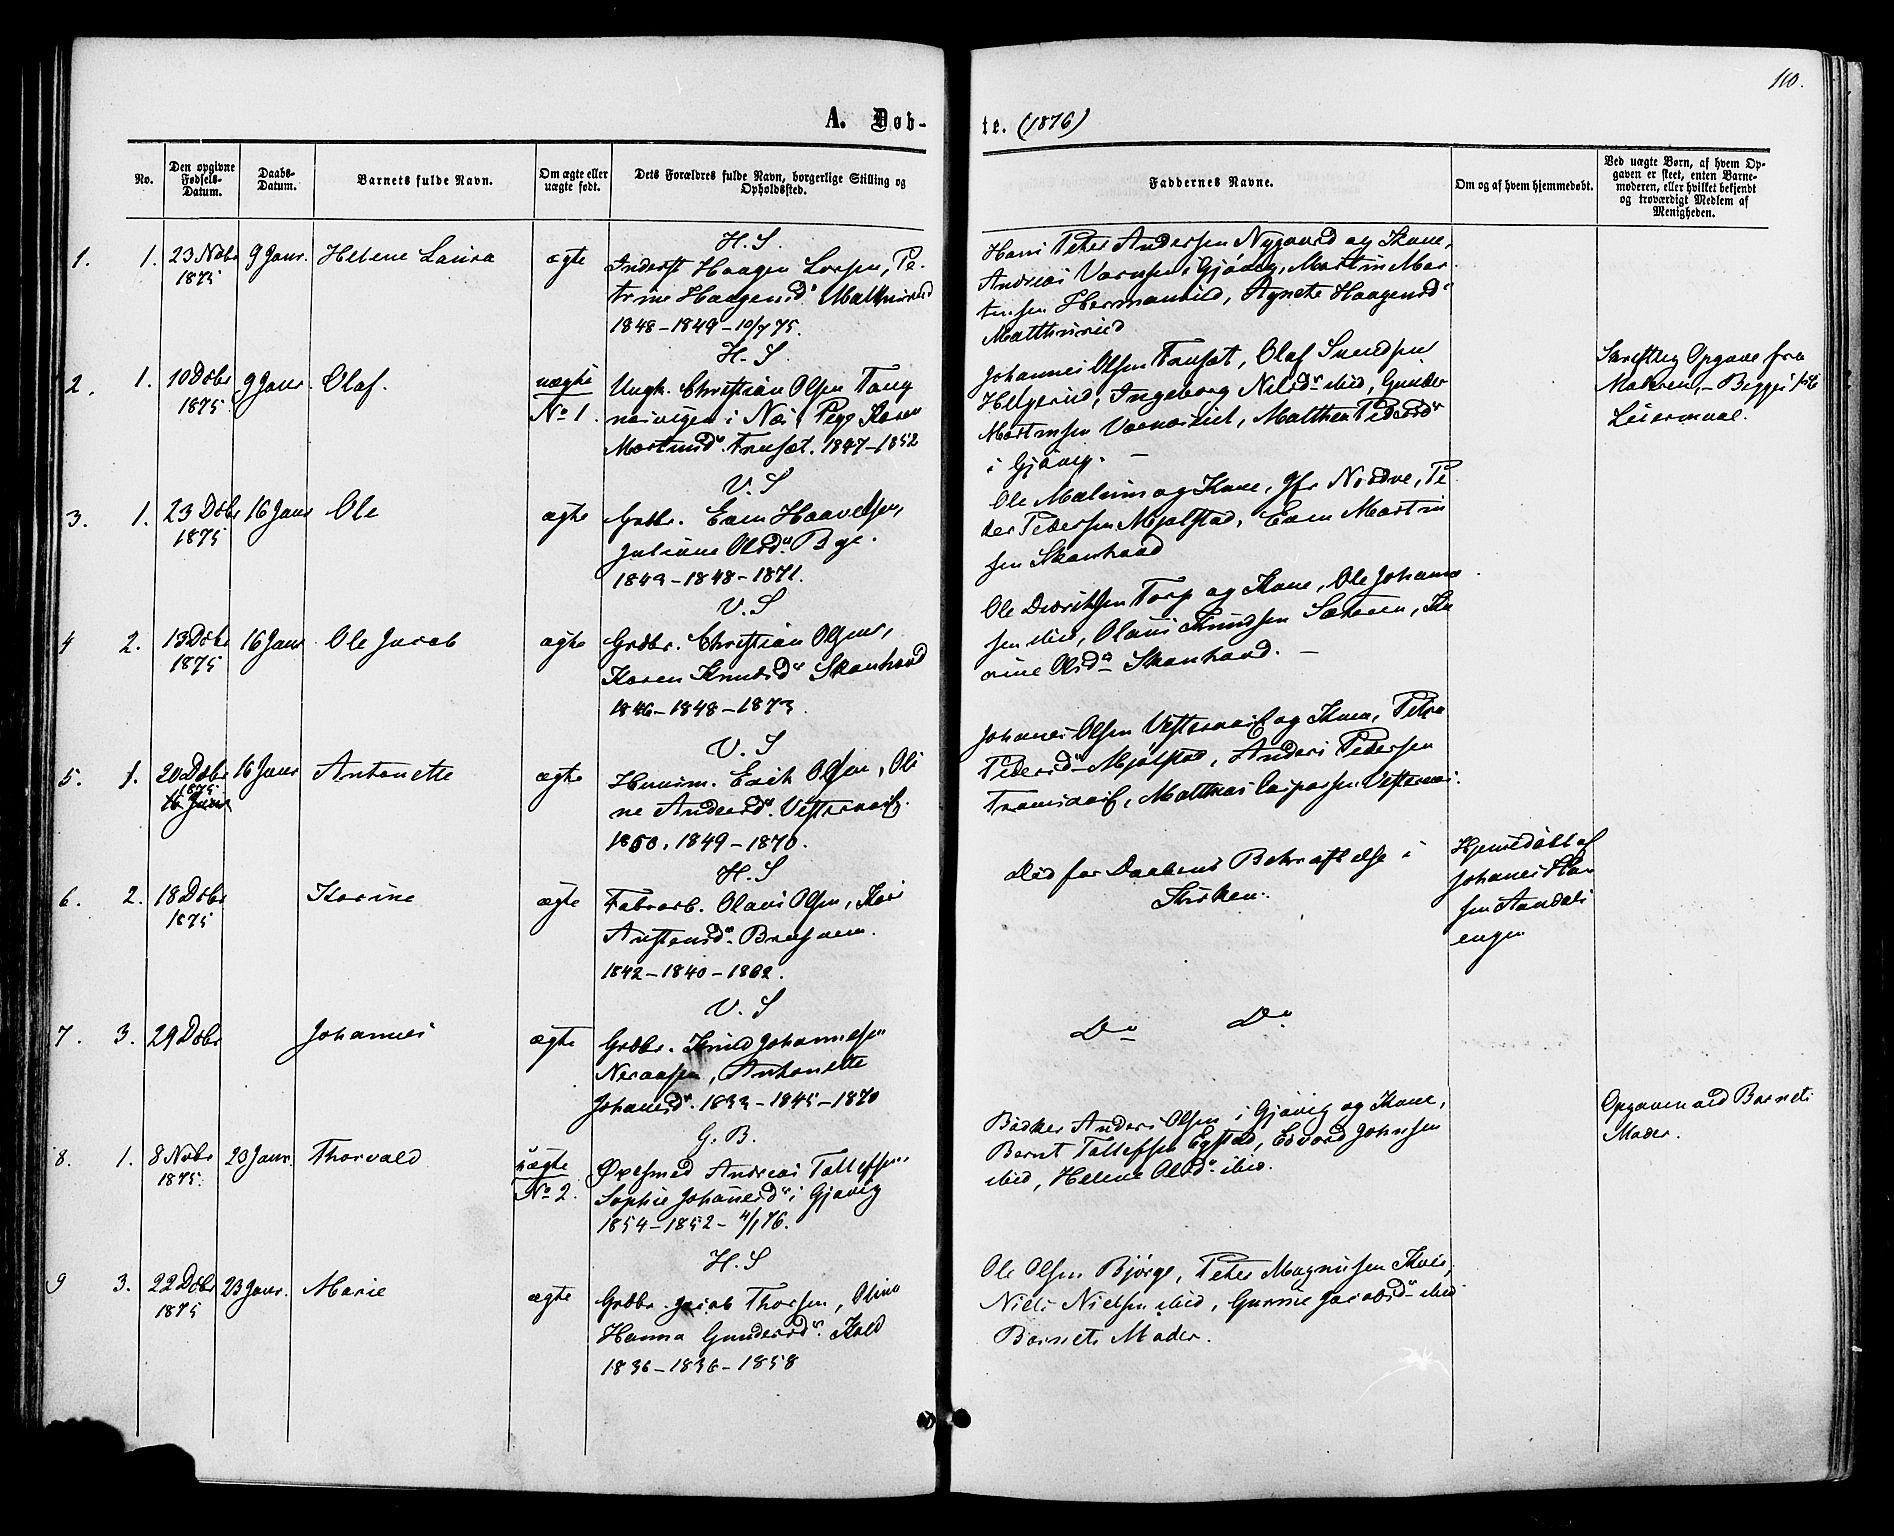 SAH, Vardal prestekontor, H/Ha/Haa/L0007: Ministerialbok nr. 7, 1867-1878, s. 110